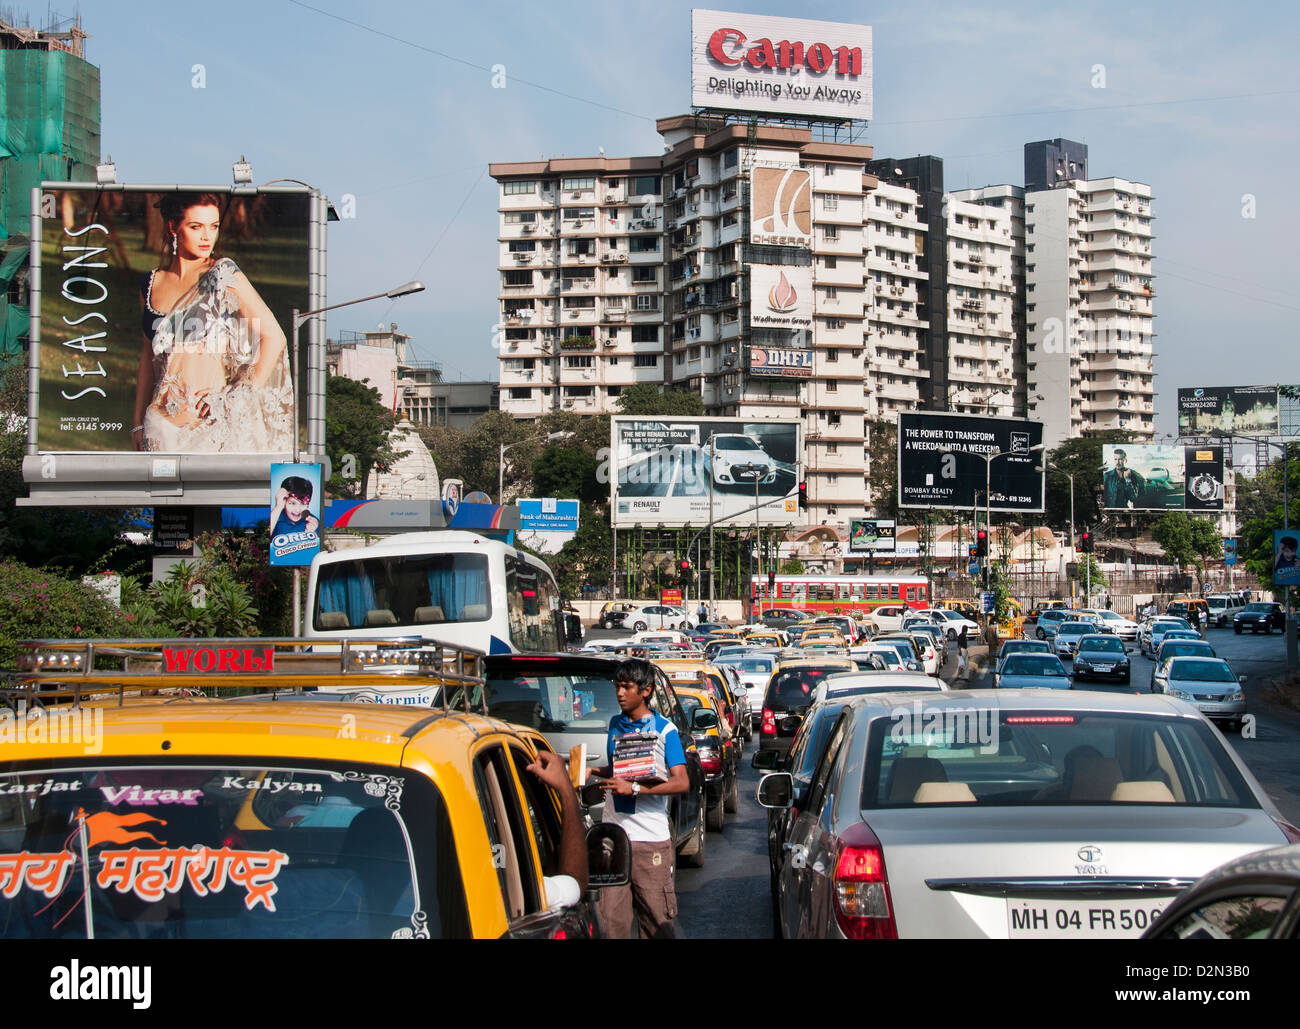 child labor The Suburbs Bandra Mumbai ( Bombay ) India Modern Architecture Traffic Jam - Stock Image